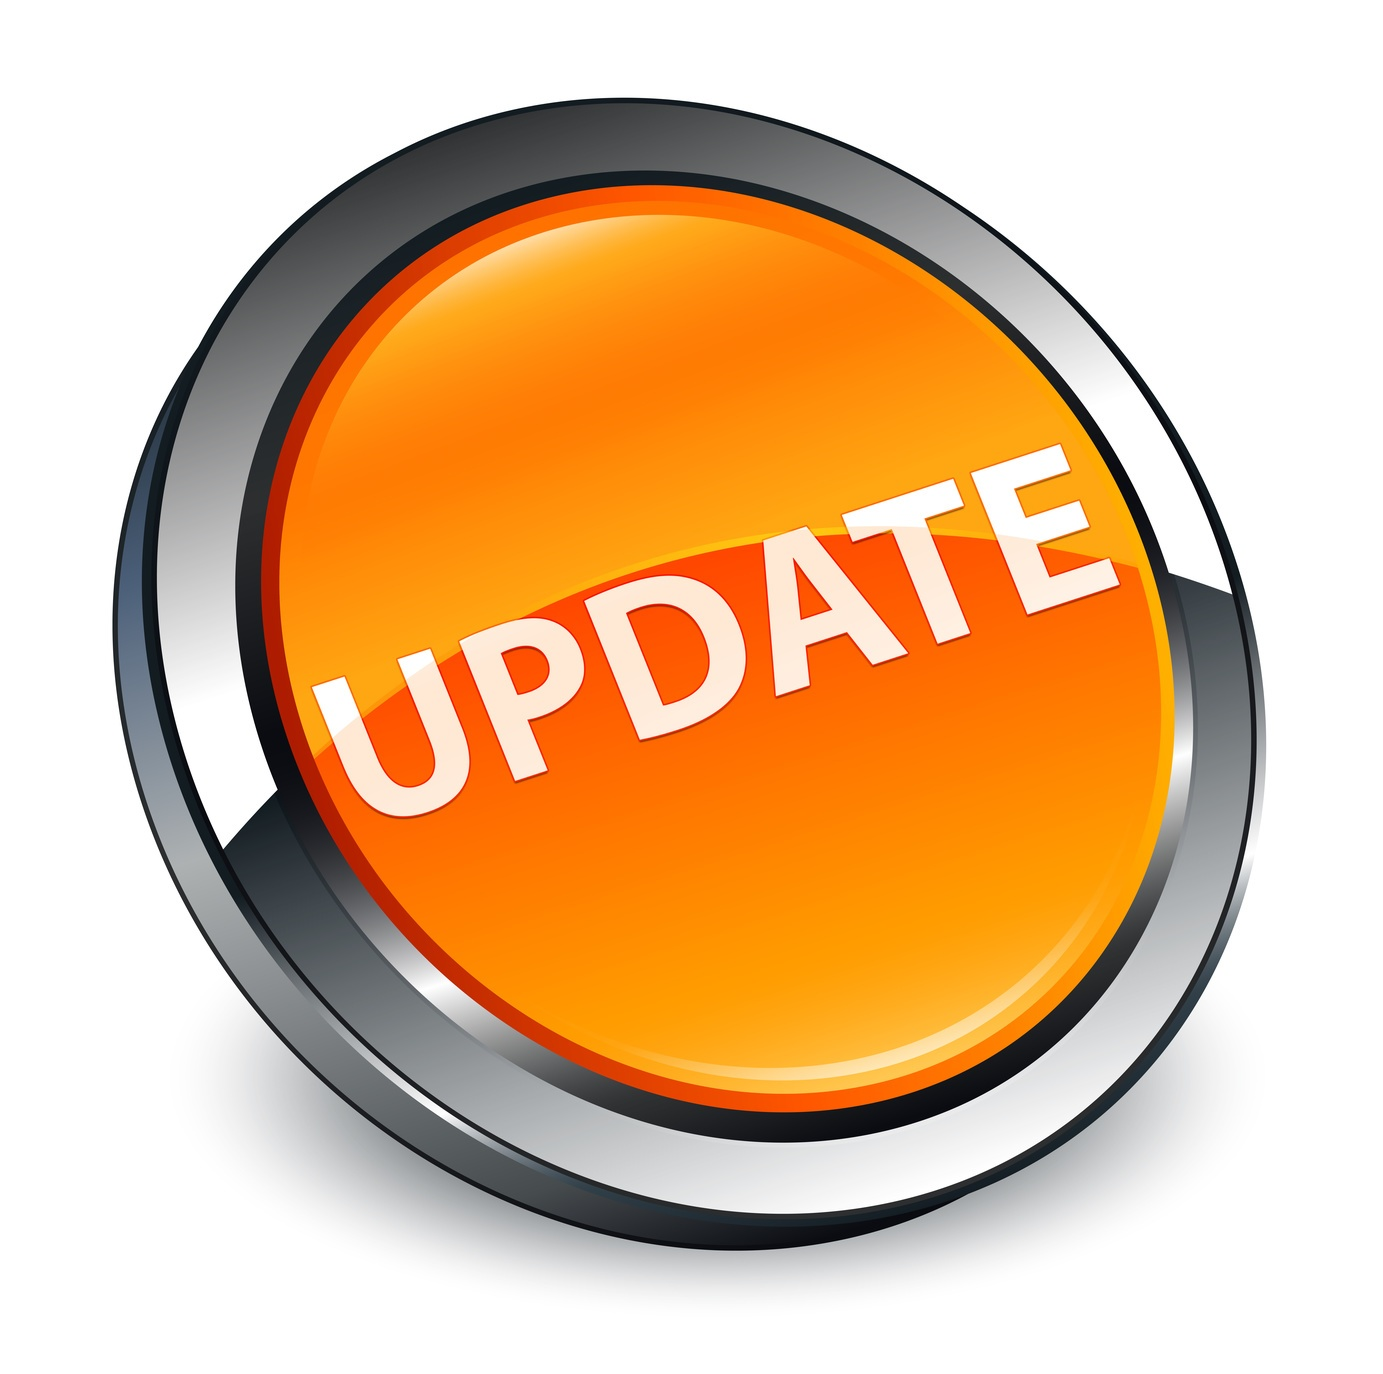 eprcs august 2018 updates